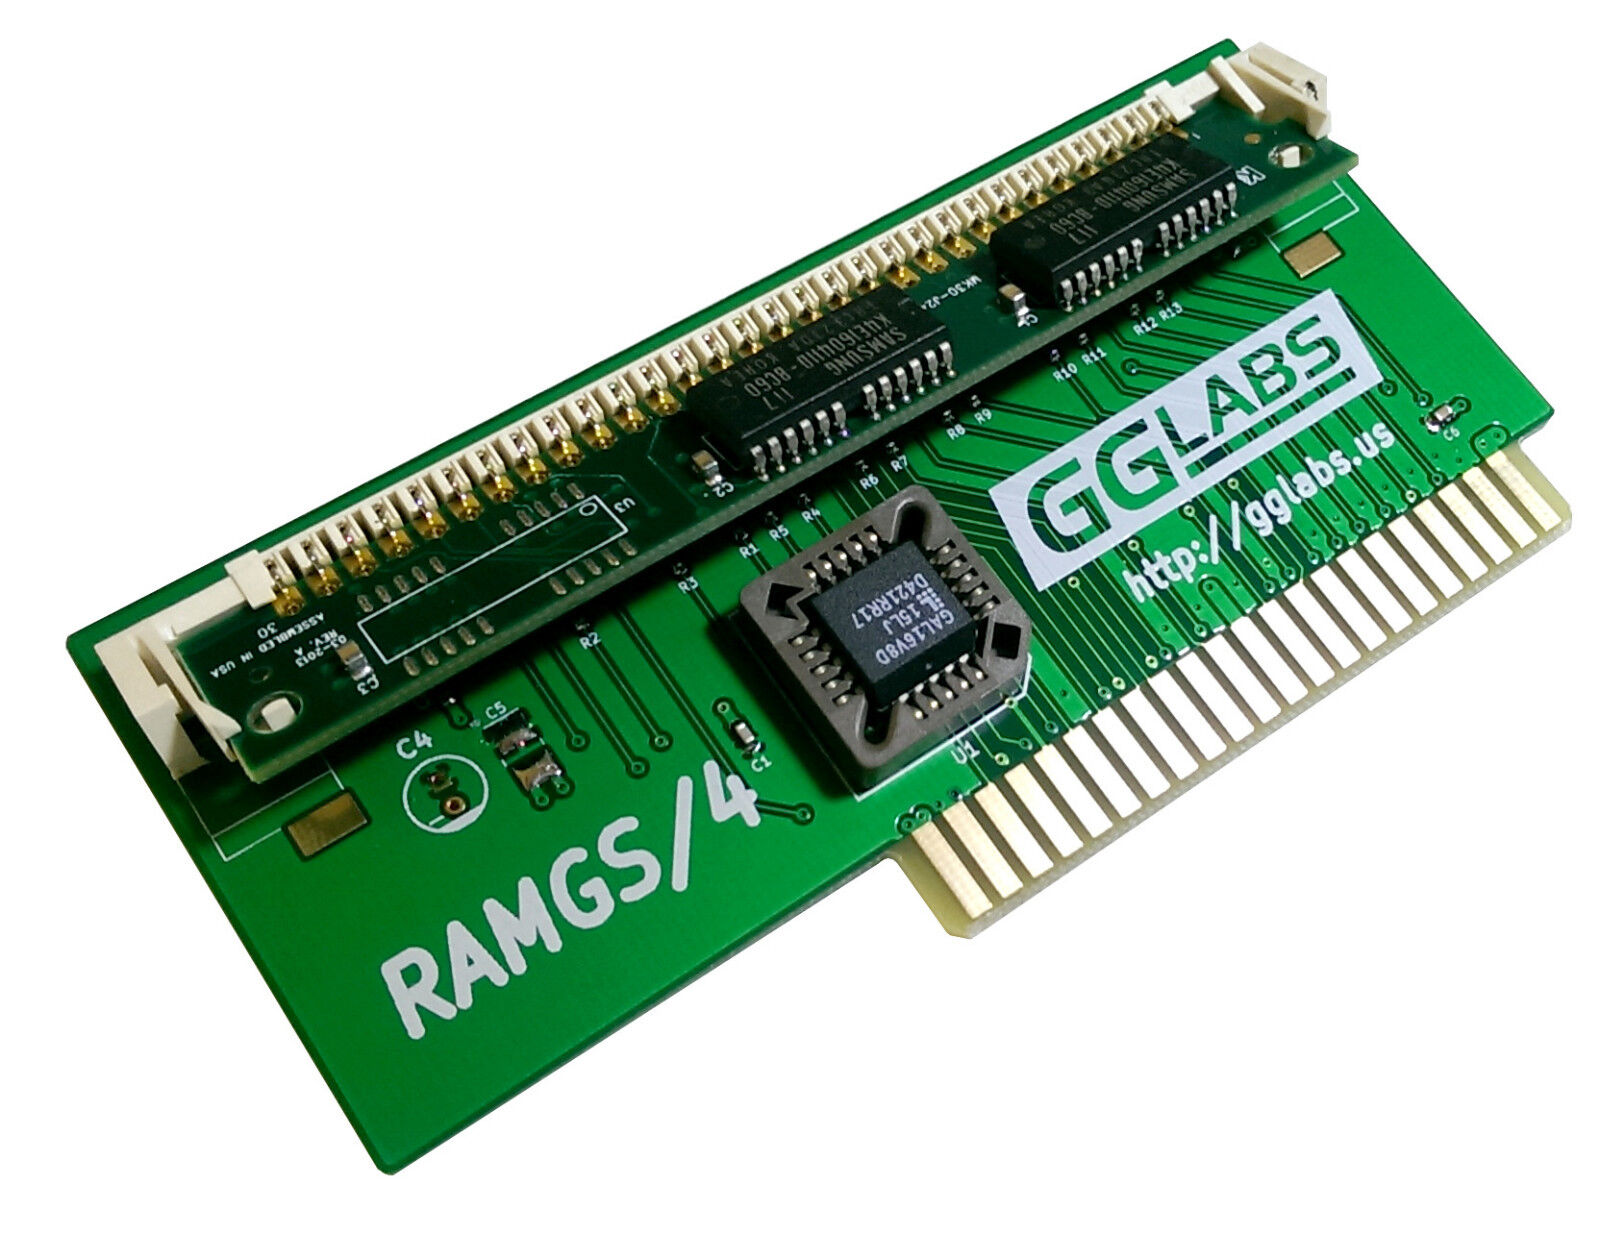 GGLABS RAMGS/4 Apple IIgs 4MB memory expansion - 4M RAM GS/OS